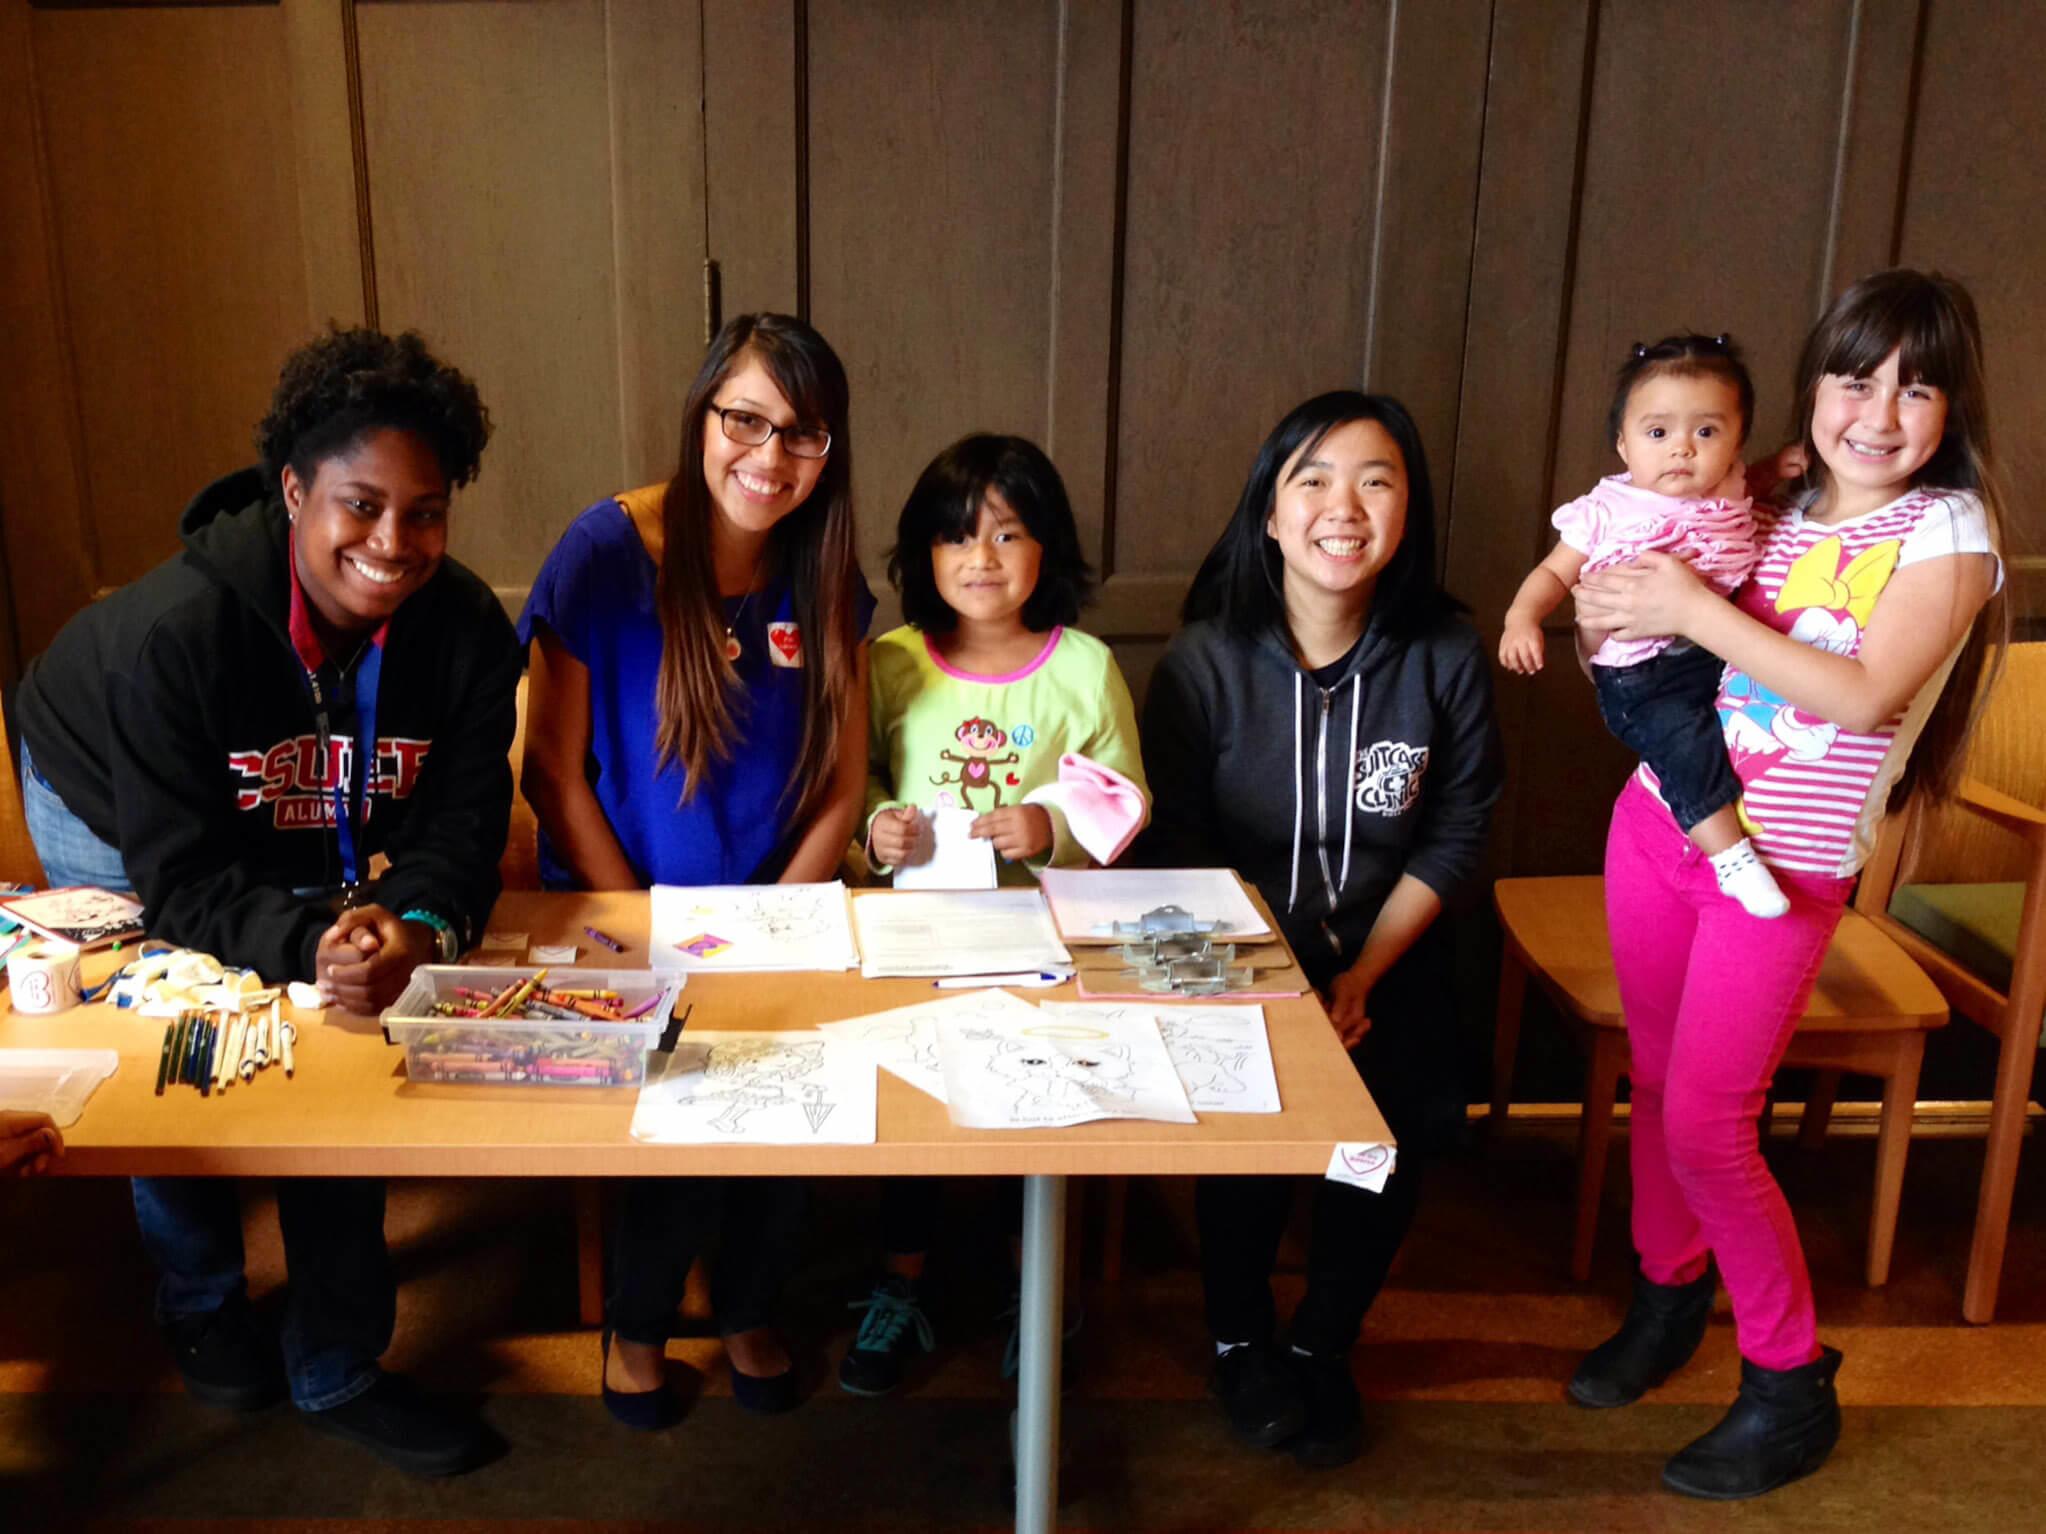 Volunteers with group of children